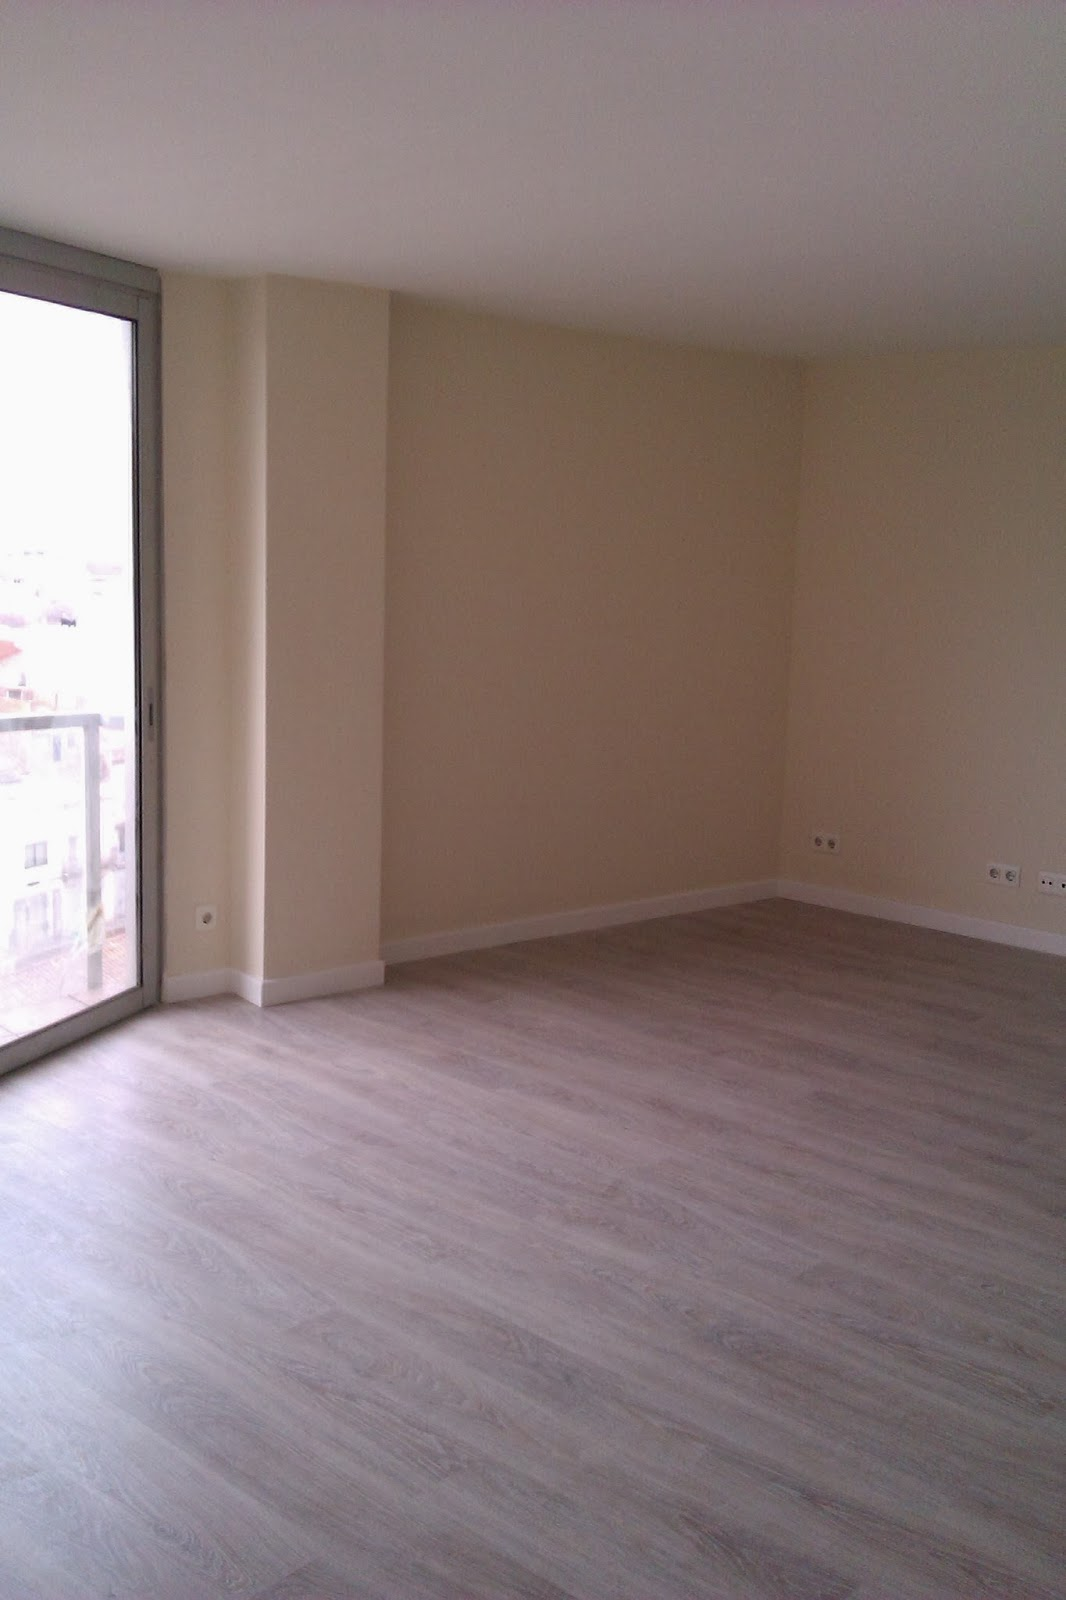 Nutaiba s l piso en alquiler en sabadell barcelona - Pisos alquiler particulares sabadell ...